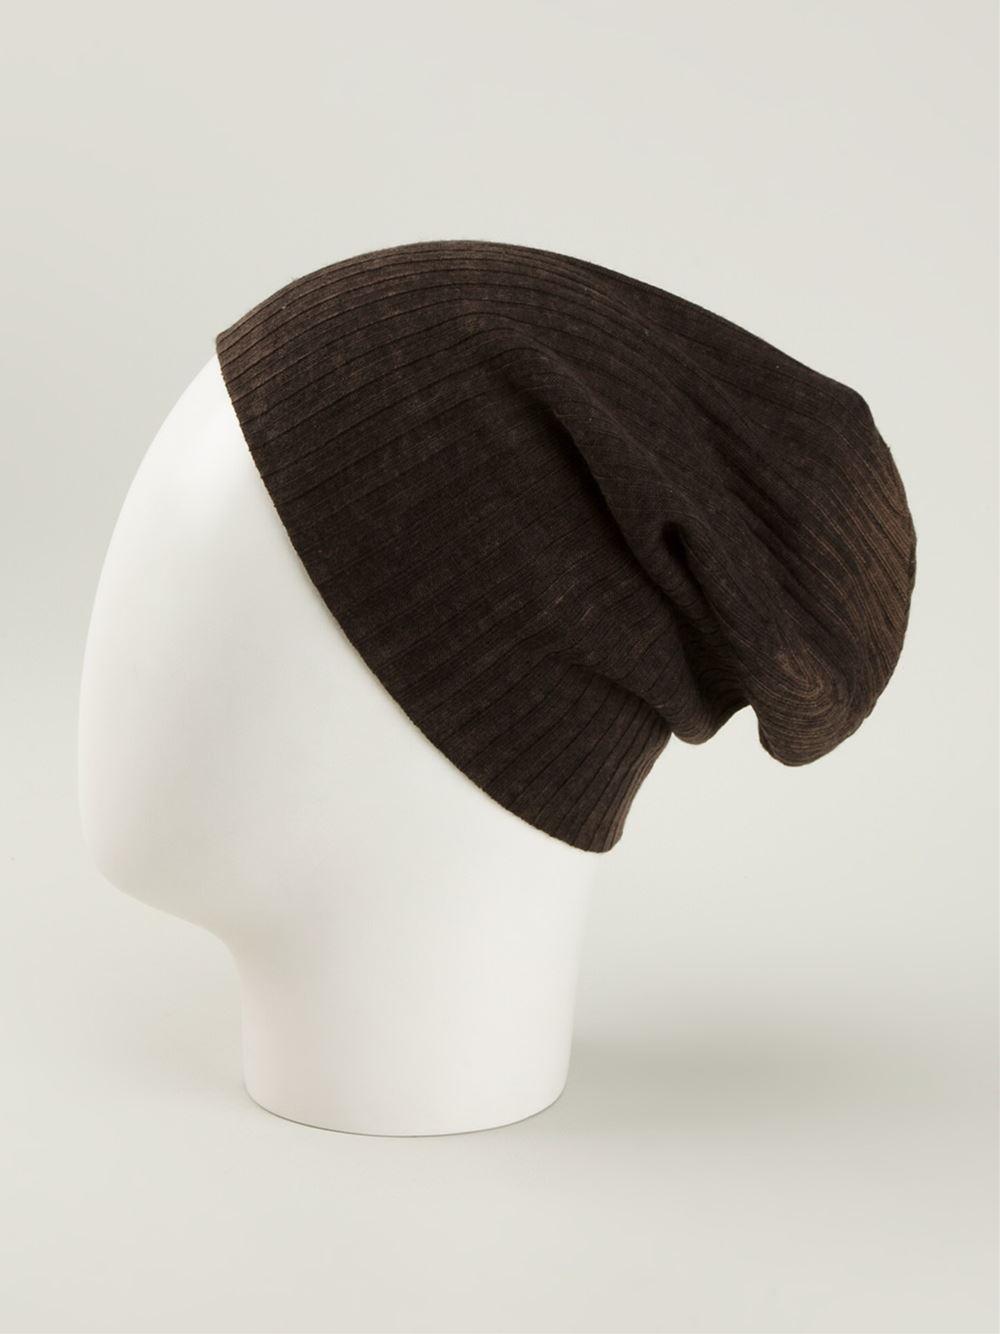 Lyst John Varvatos Ribbed Beanie Hat In Brown For Men. Lyst John Varvatos  Ombre Random Feed ... 154b5baae669